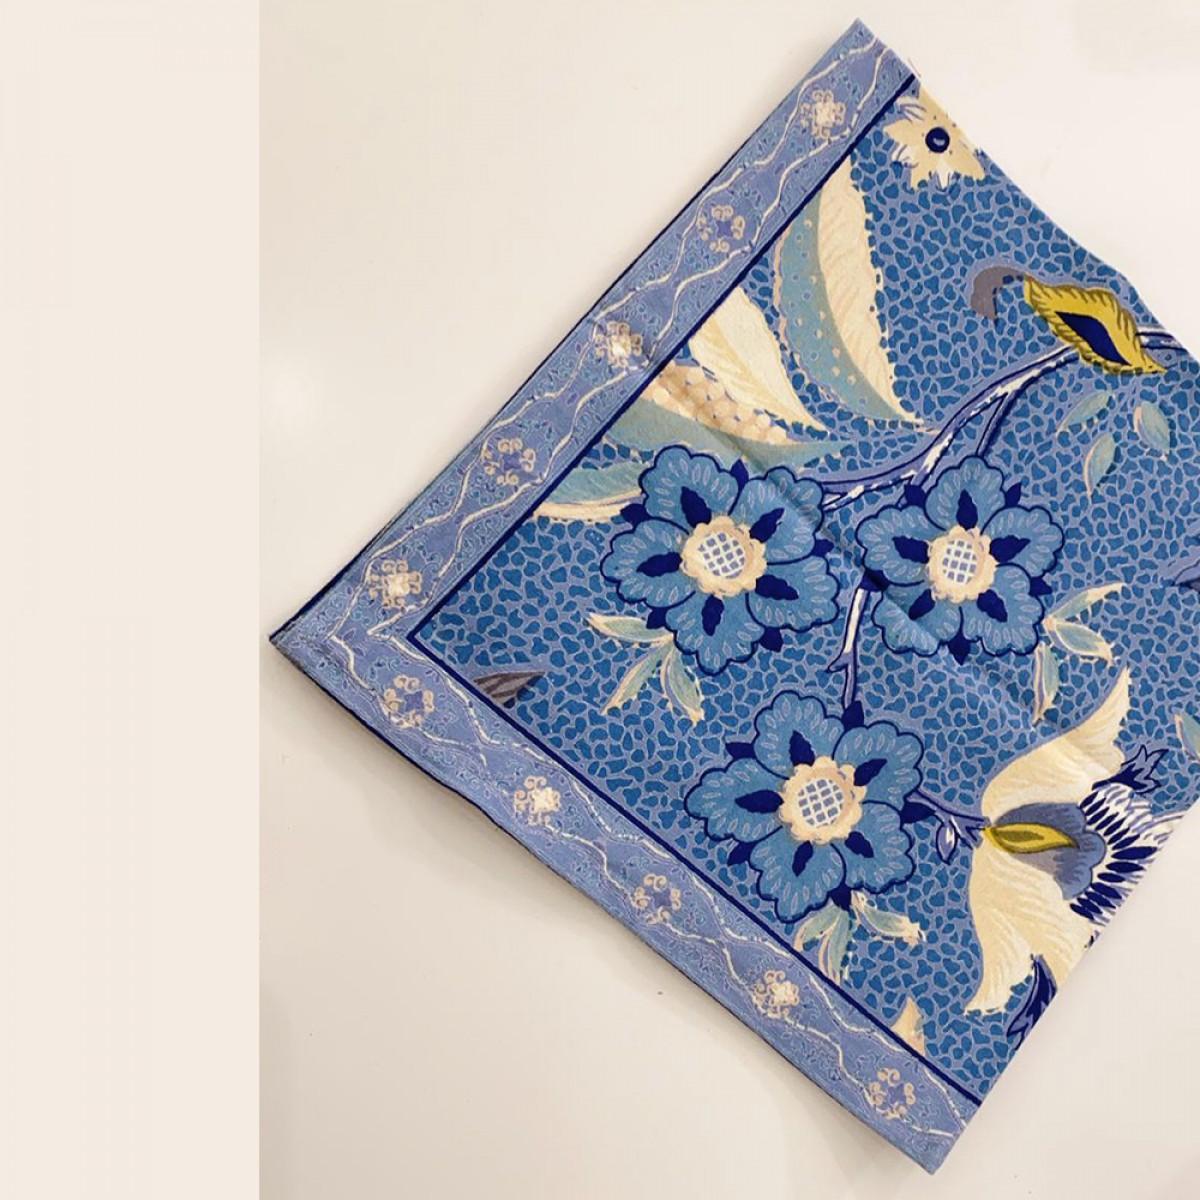 Cotton Printed Napkin - Blue Flower (Set of 6)